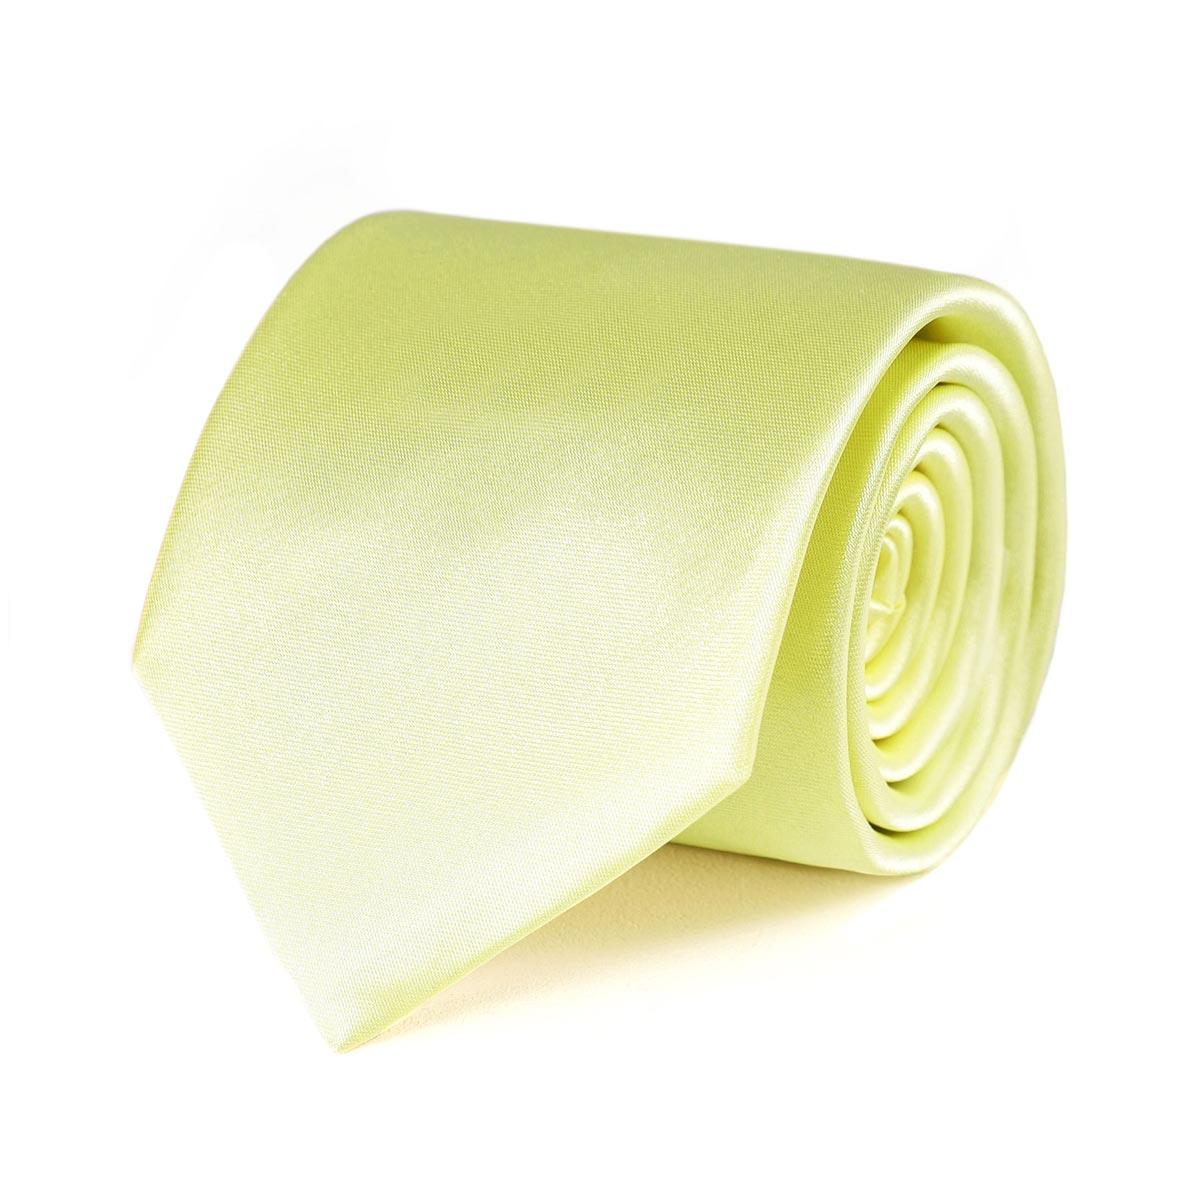 _Cravate-jaune-napoli-homme